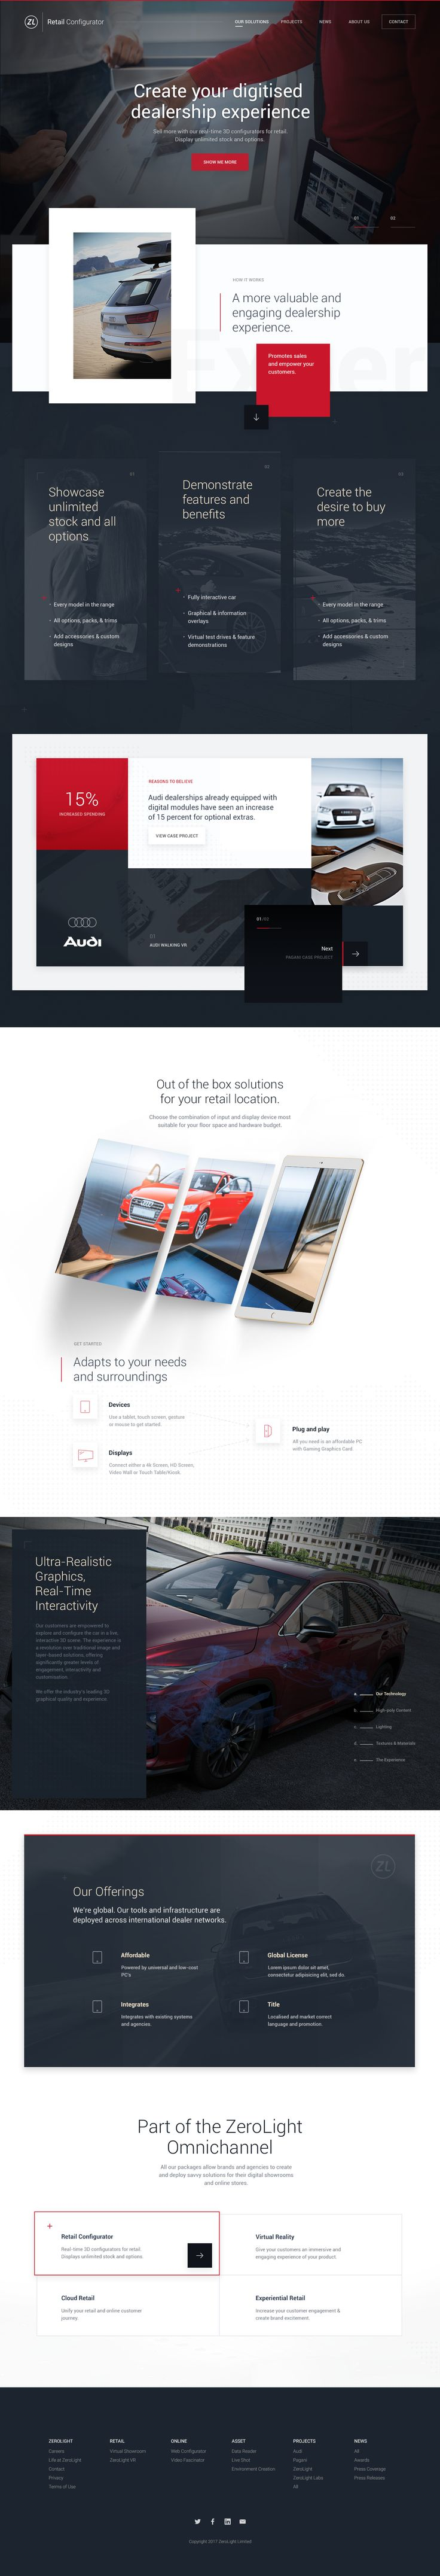 Zerolight concept retail